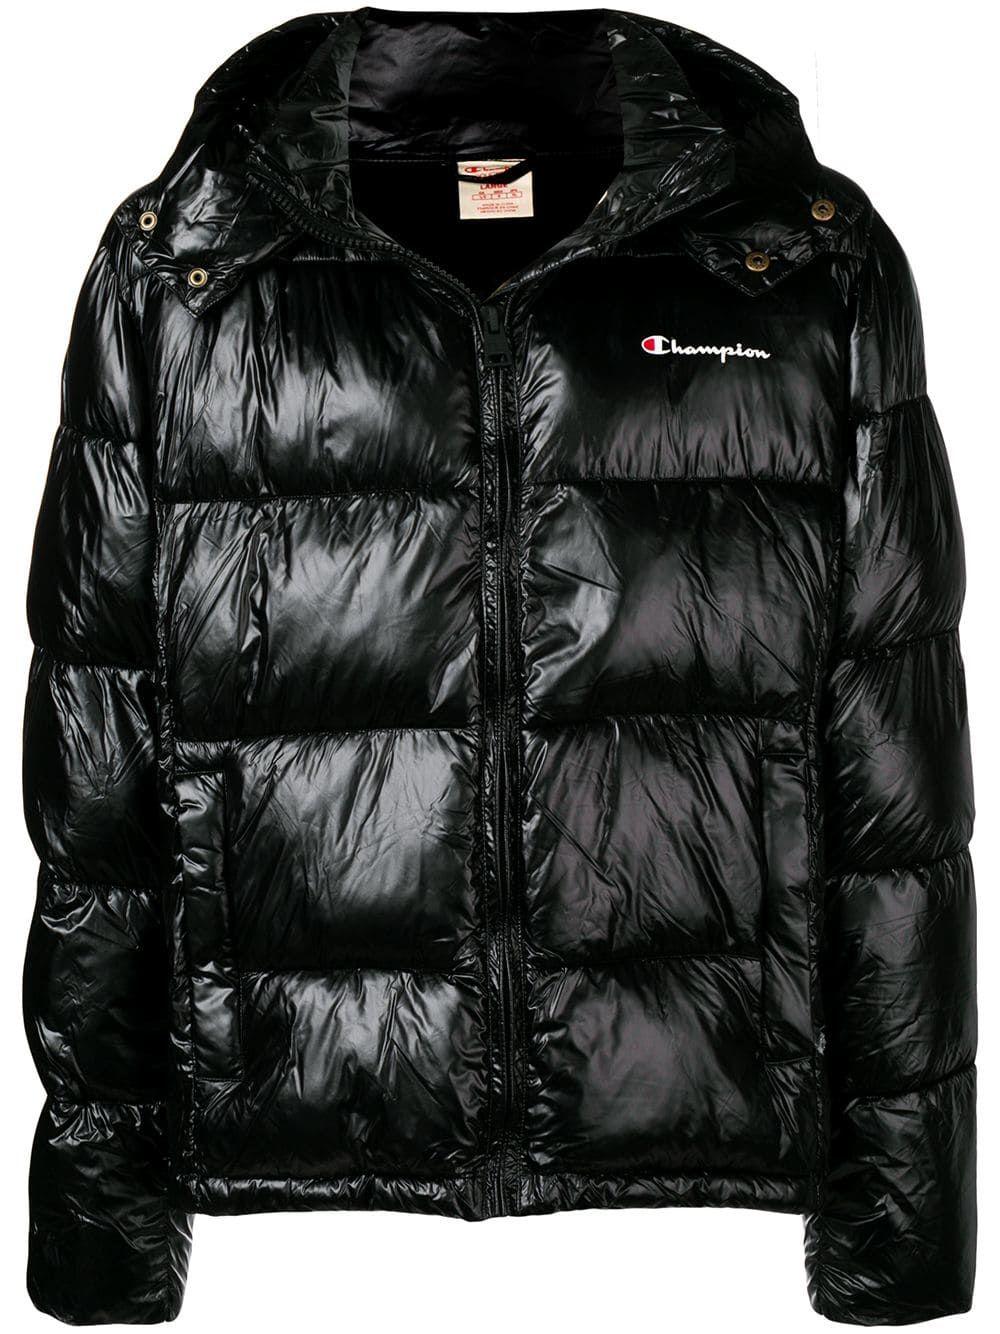 Champion Padded Jacket In Black Modesens Black Padded Jacket Padded Jacket Jackets [ 1334 x 1000 Pixel ]